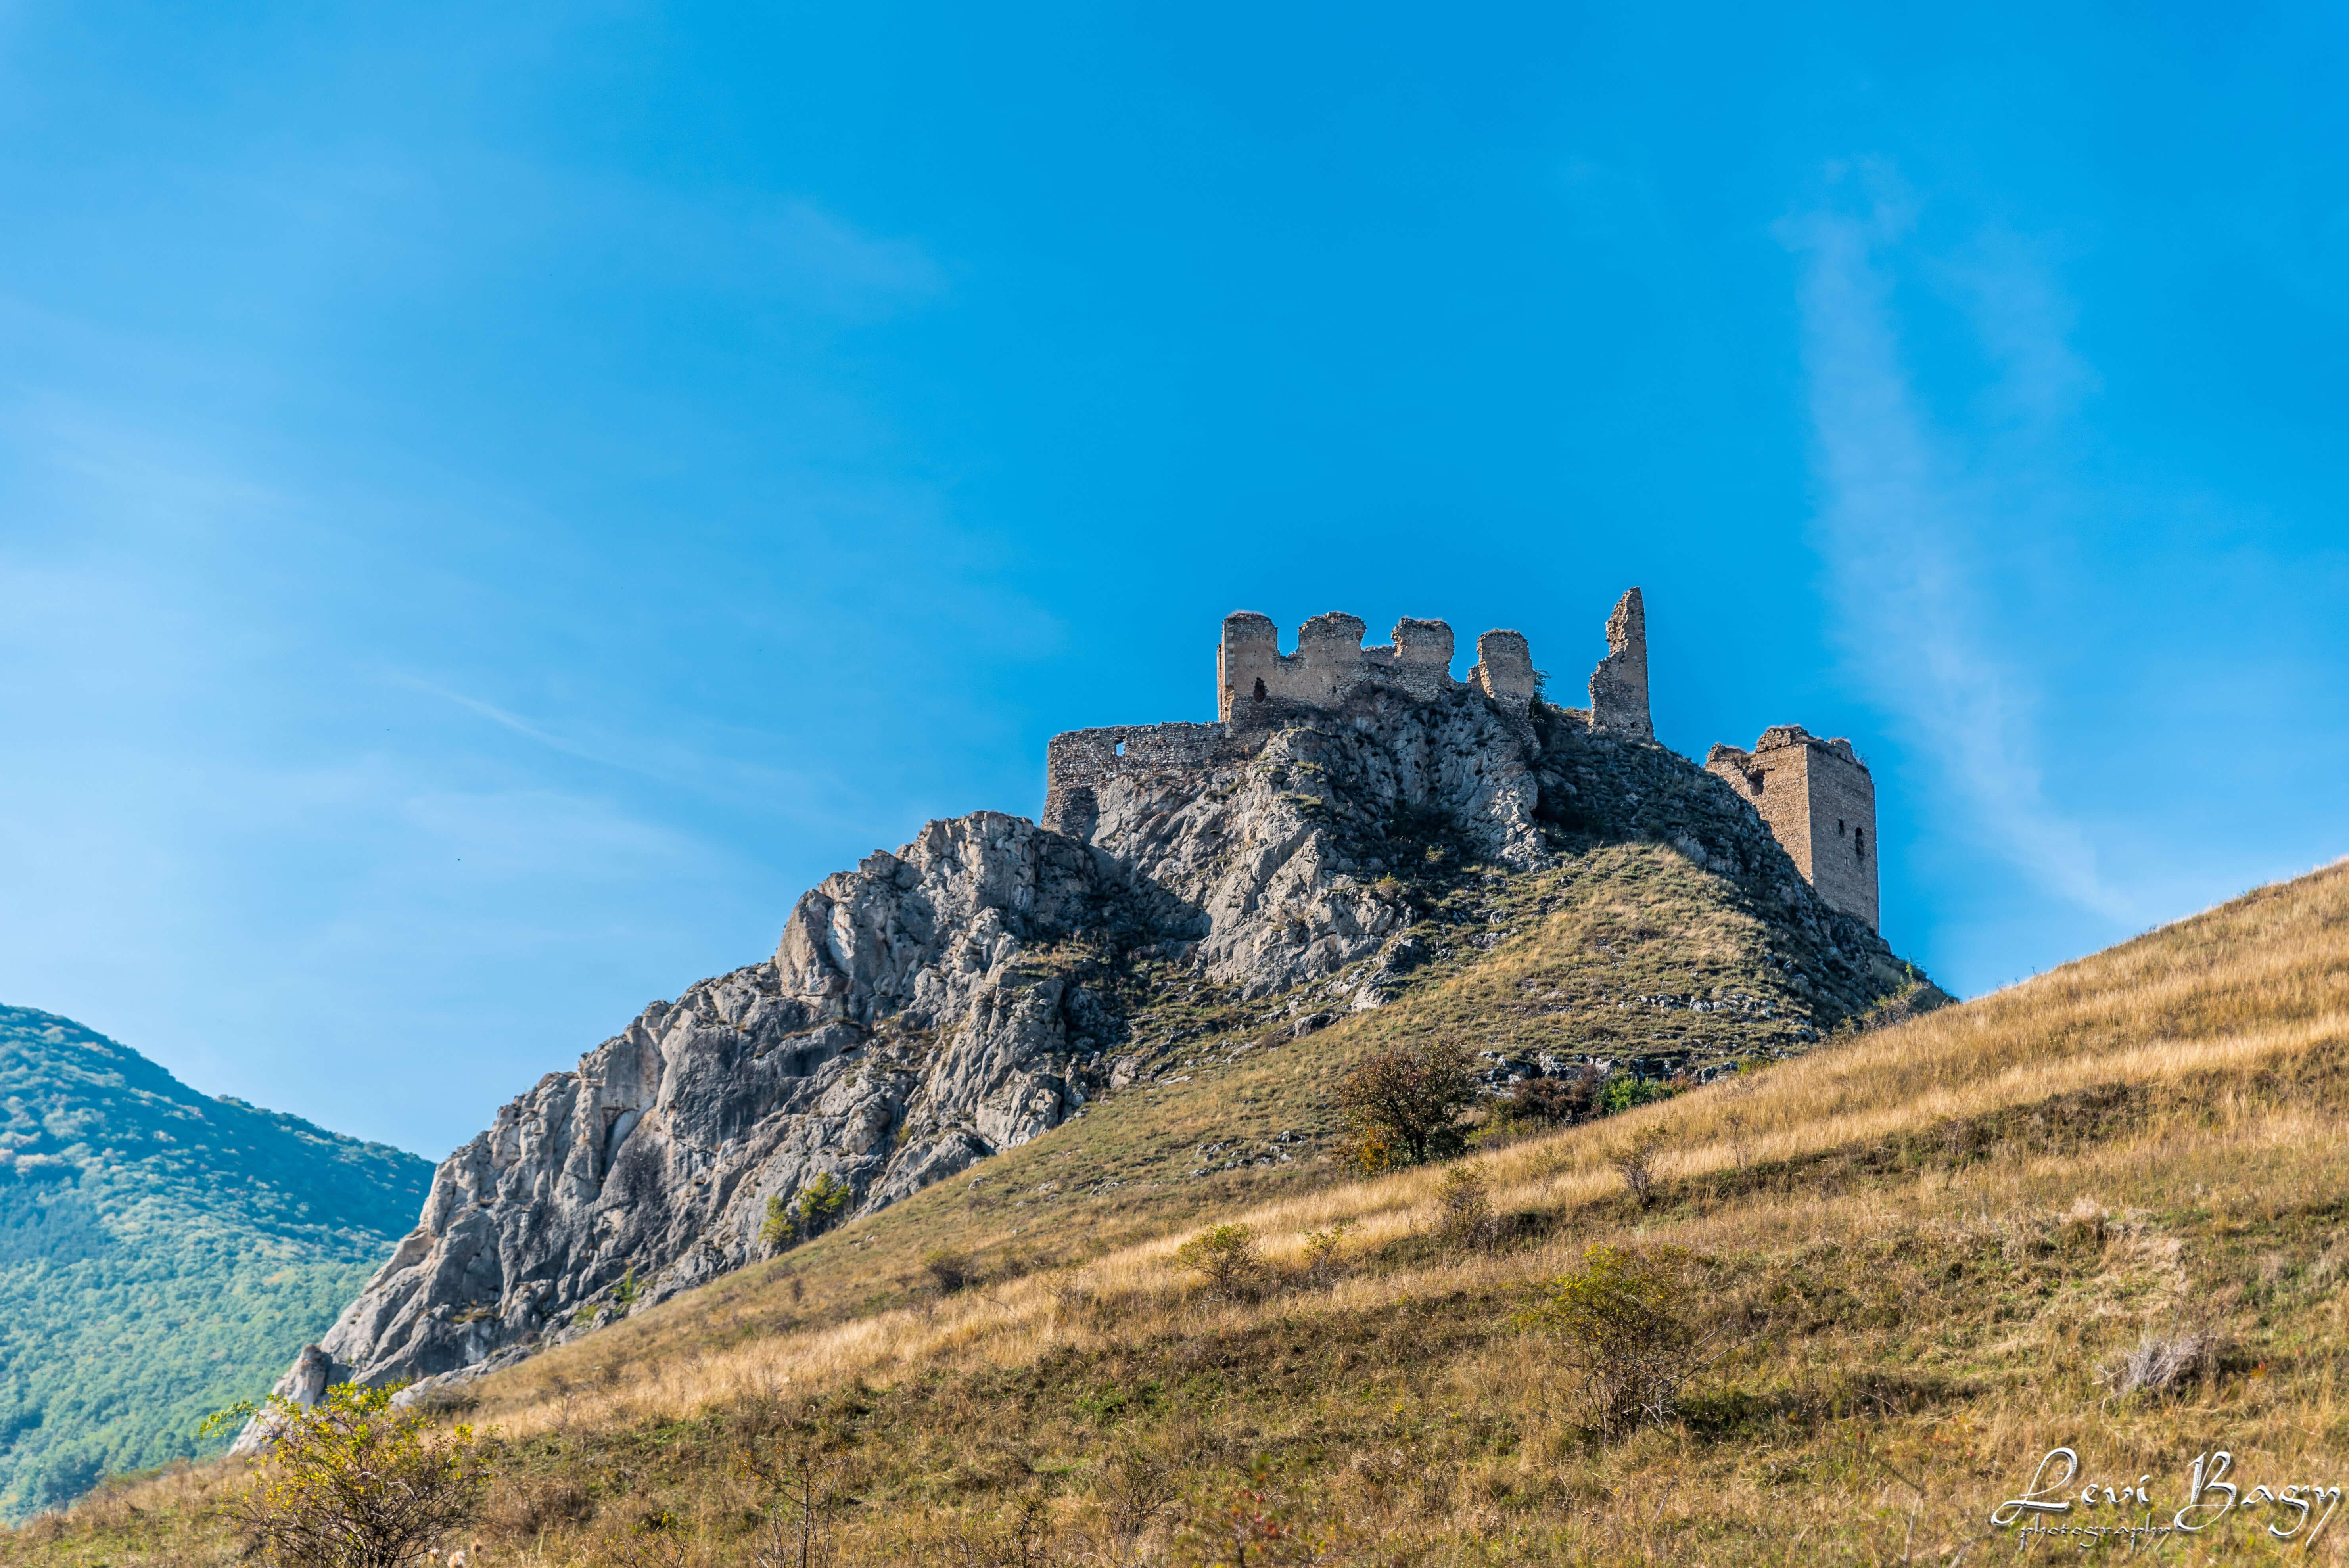 Cetatea Coltesti - Levi Bagy Photography